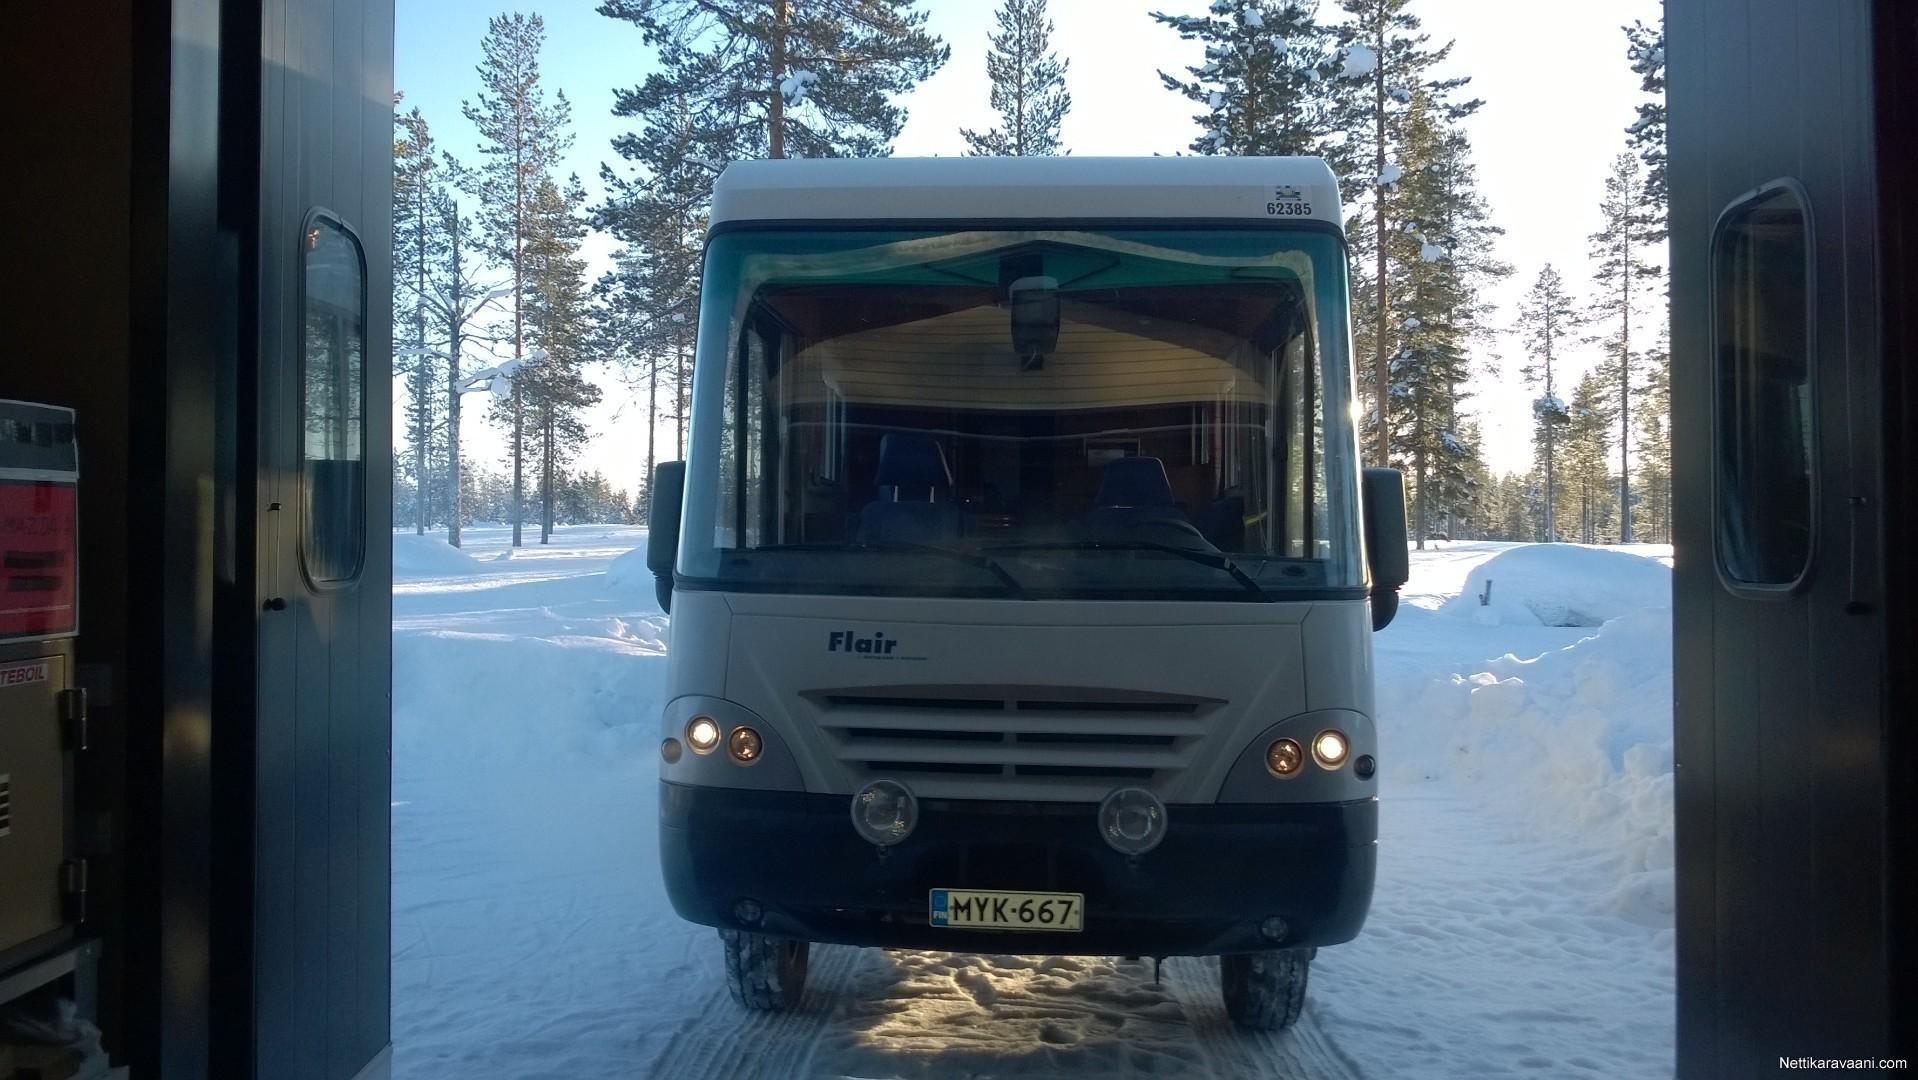 Flair 8000 i, Iveco 2001 - Travel truck - Intergrated - Nettikaravaani